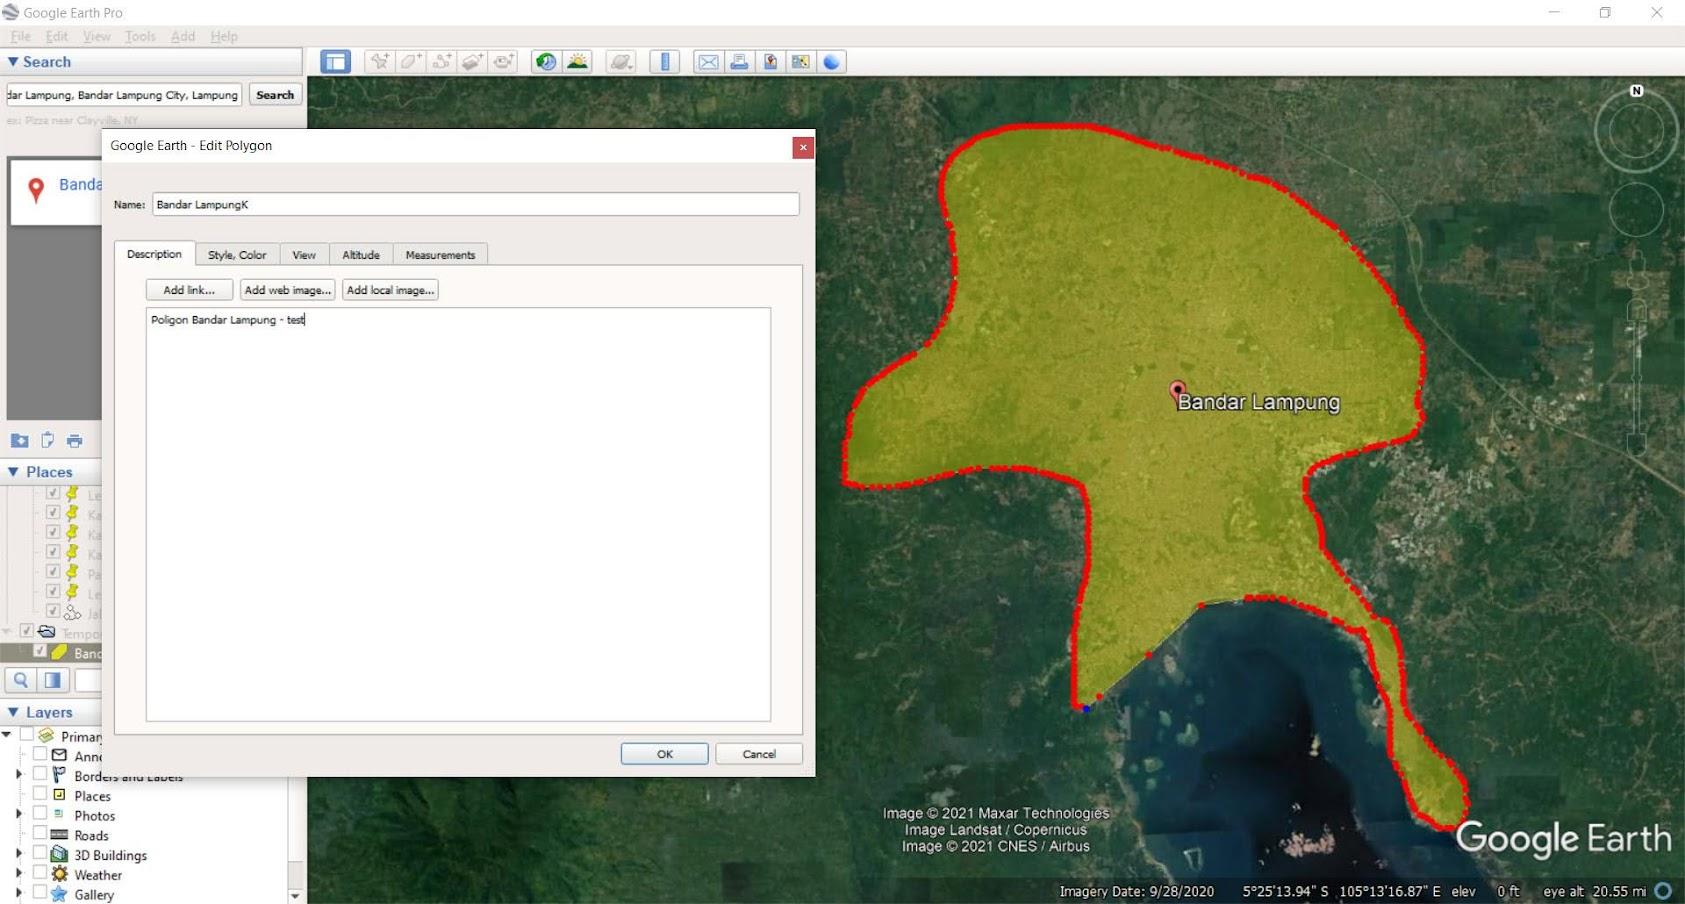 Dijitasi poligon di Google Earth